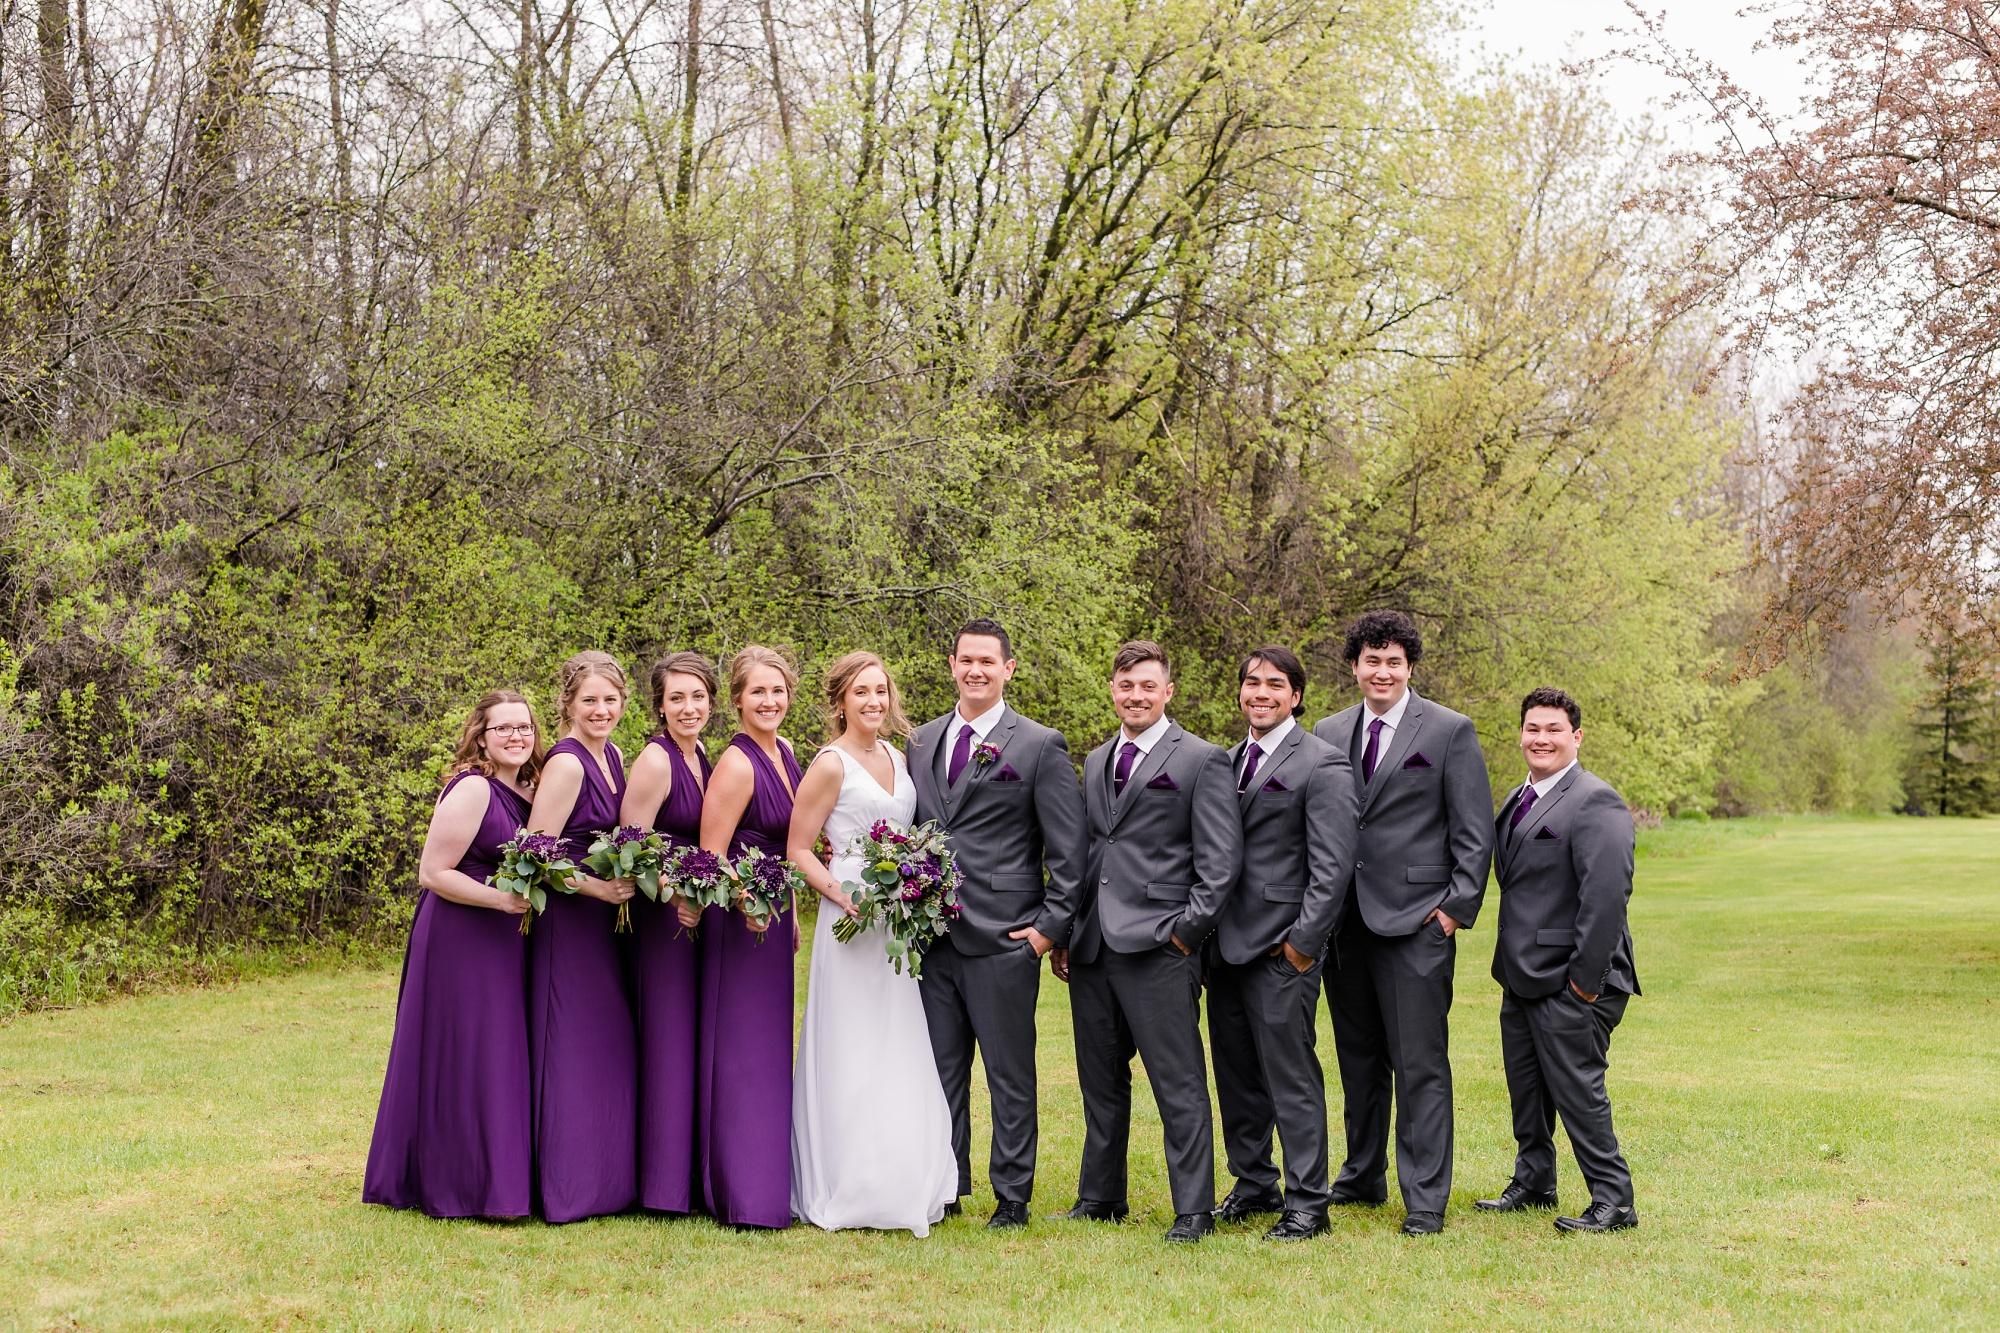 Amber Langerud Photography_Catholic Spring Wedding with Purple Accents_6317.jpg